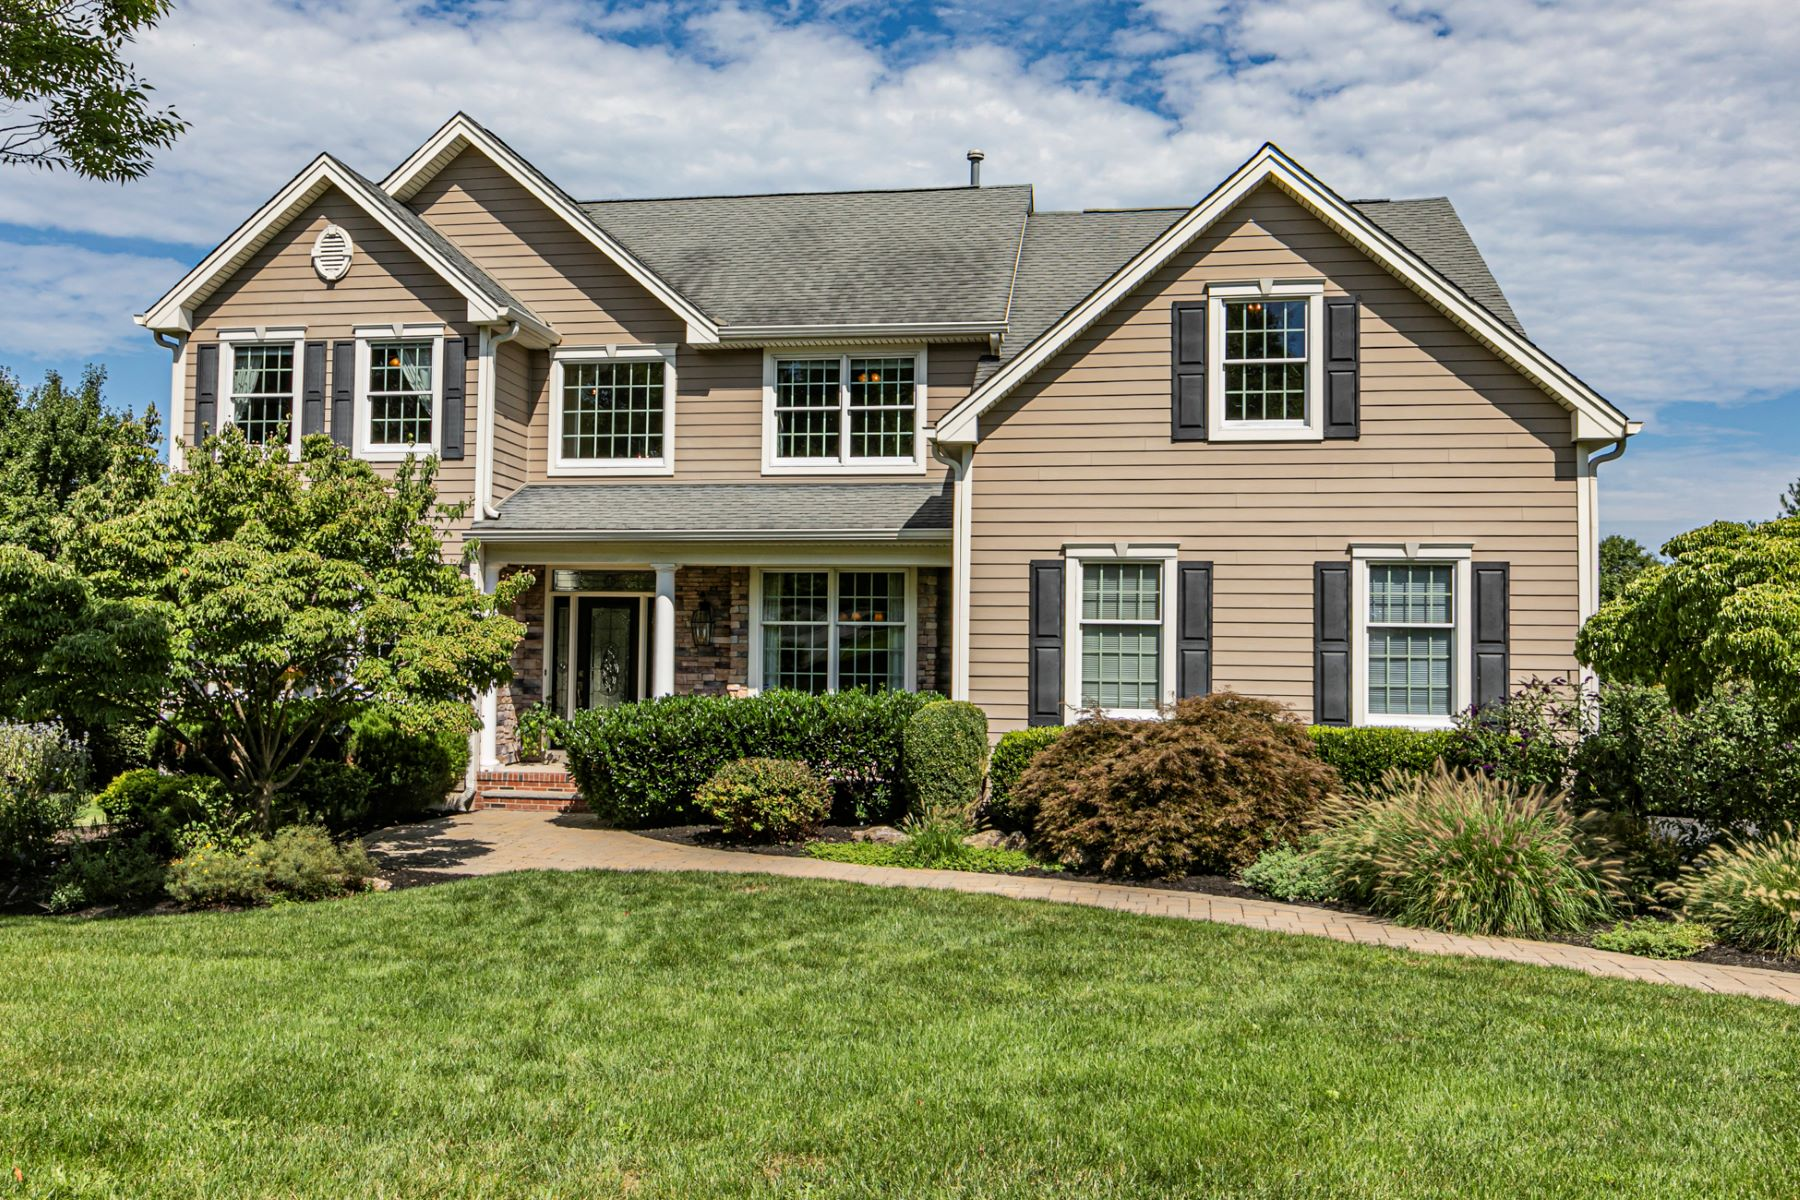 Single Family Homes için Satış at Expansively Upgraded In Cherry Valley 8 Old Warson Court, Skillman, New Jersey 08558 Amerika Birleşik Devletleri